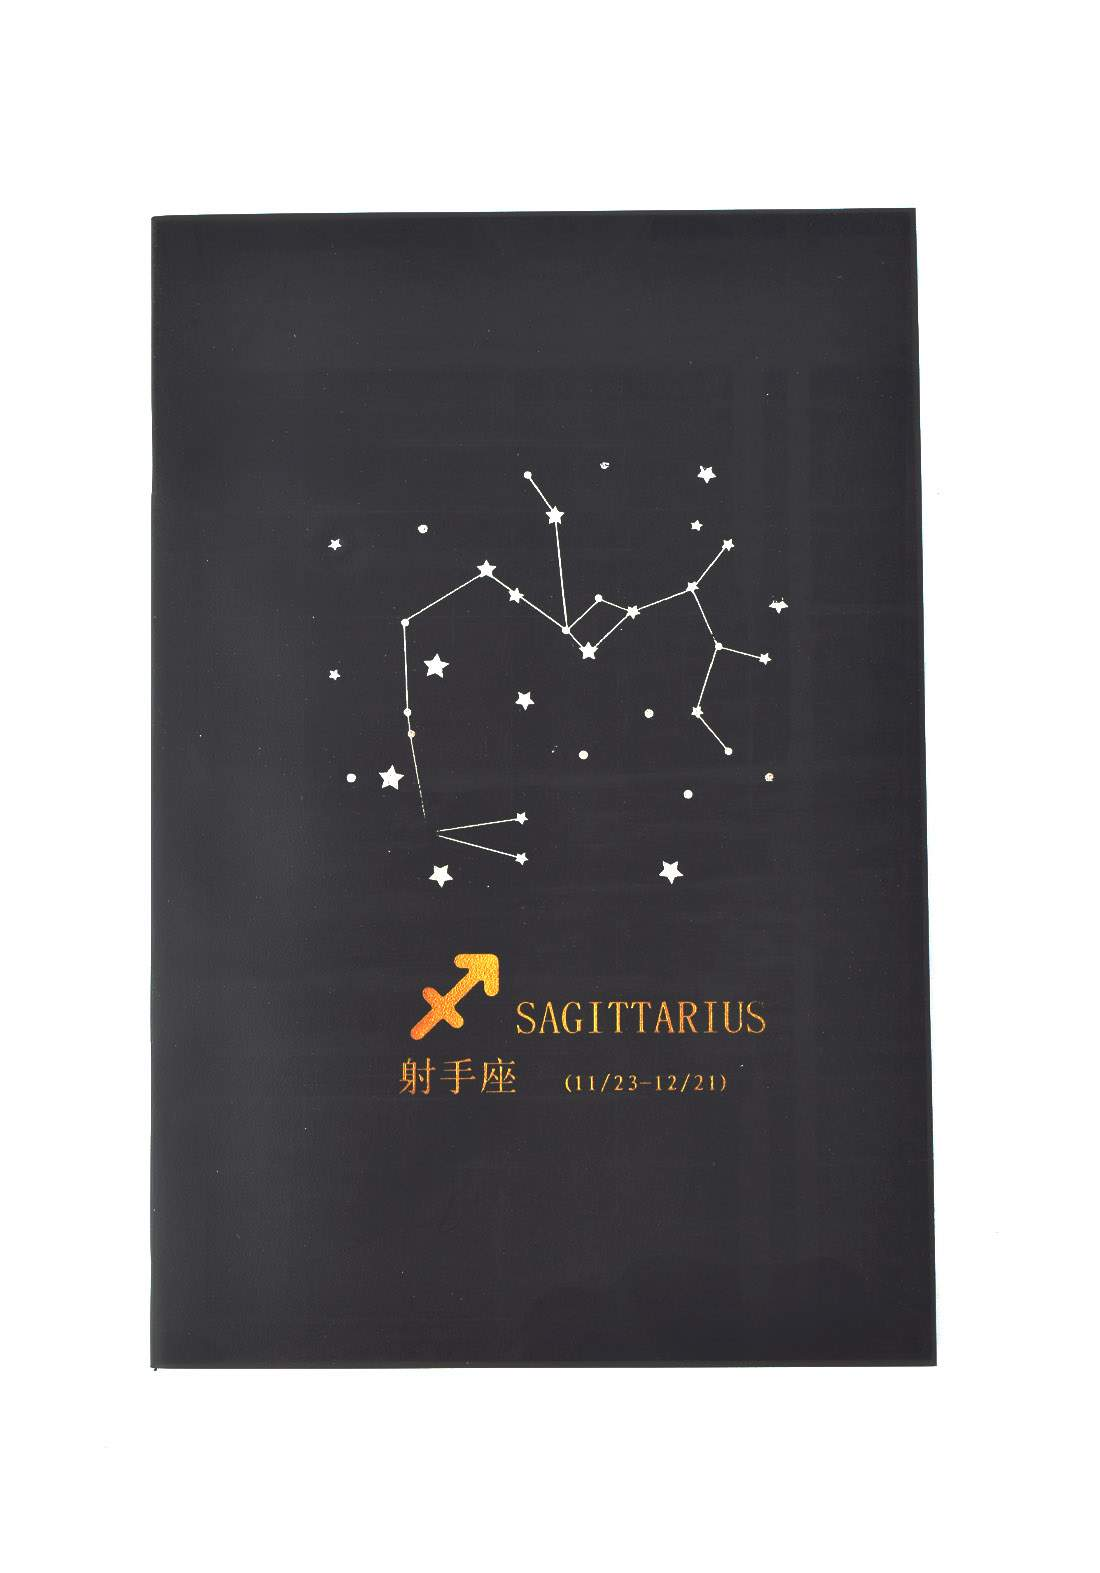 Big Black Drawing Book 24 Sheets-Sagittarius دفتر رسم اسود كبير بطبعة برج القوس